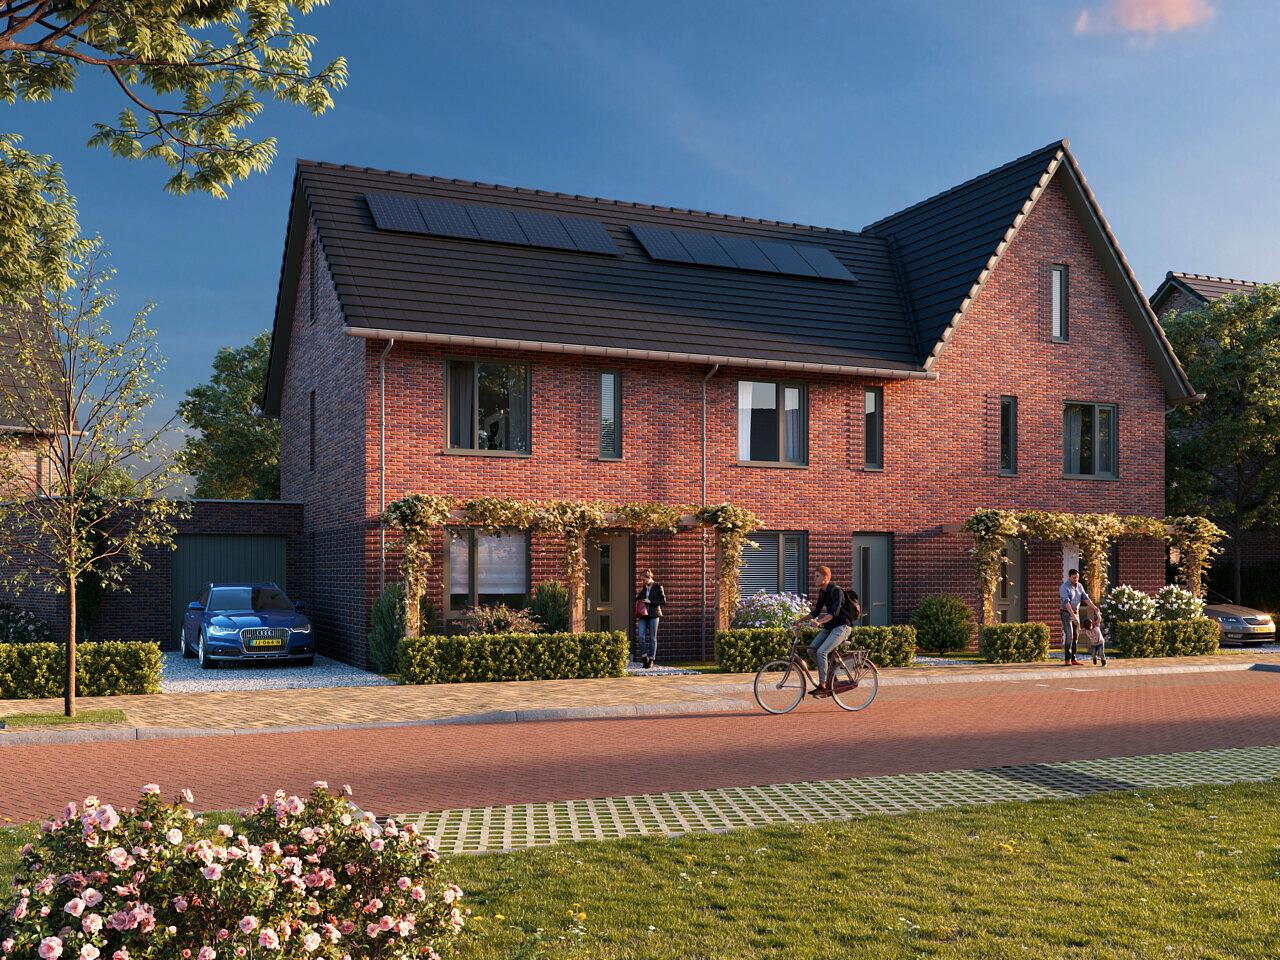 Thuis in Bloemendal Barneveld H - Heilijgers